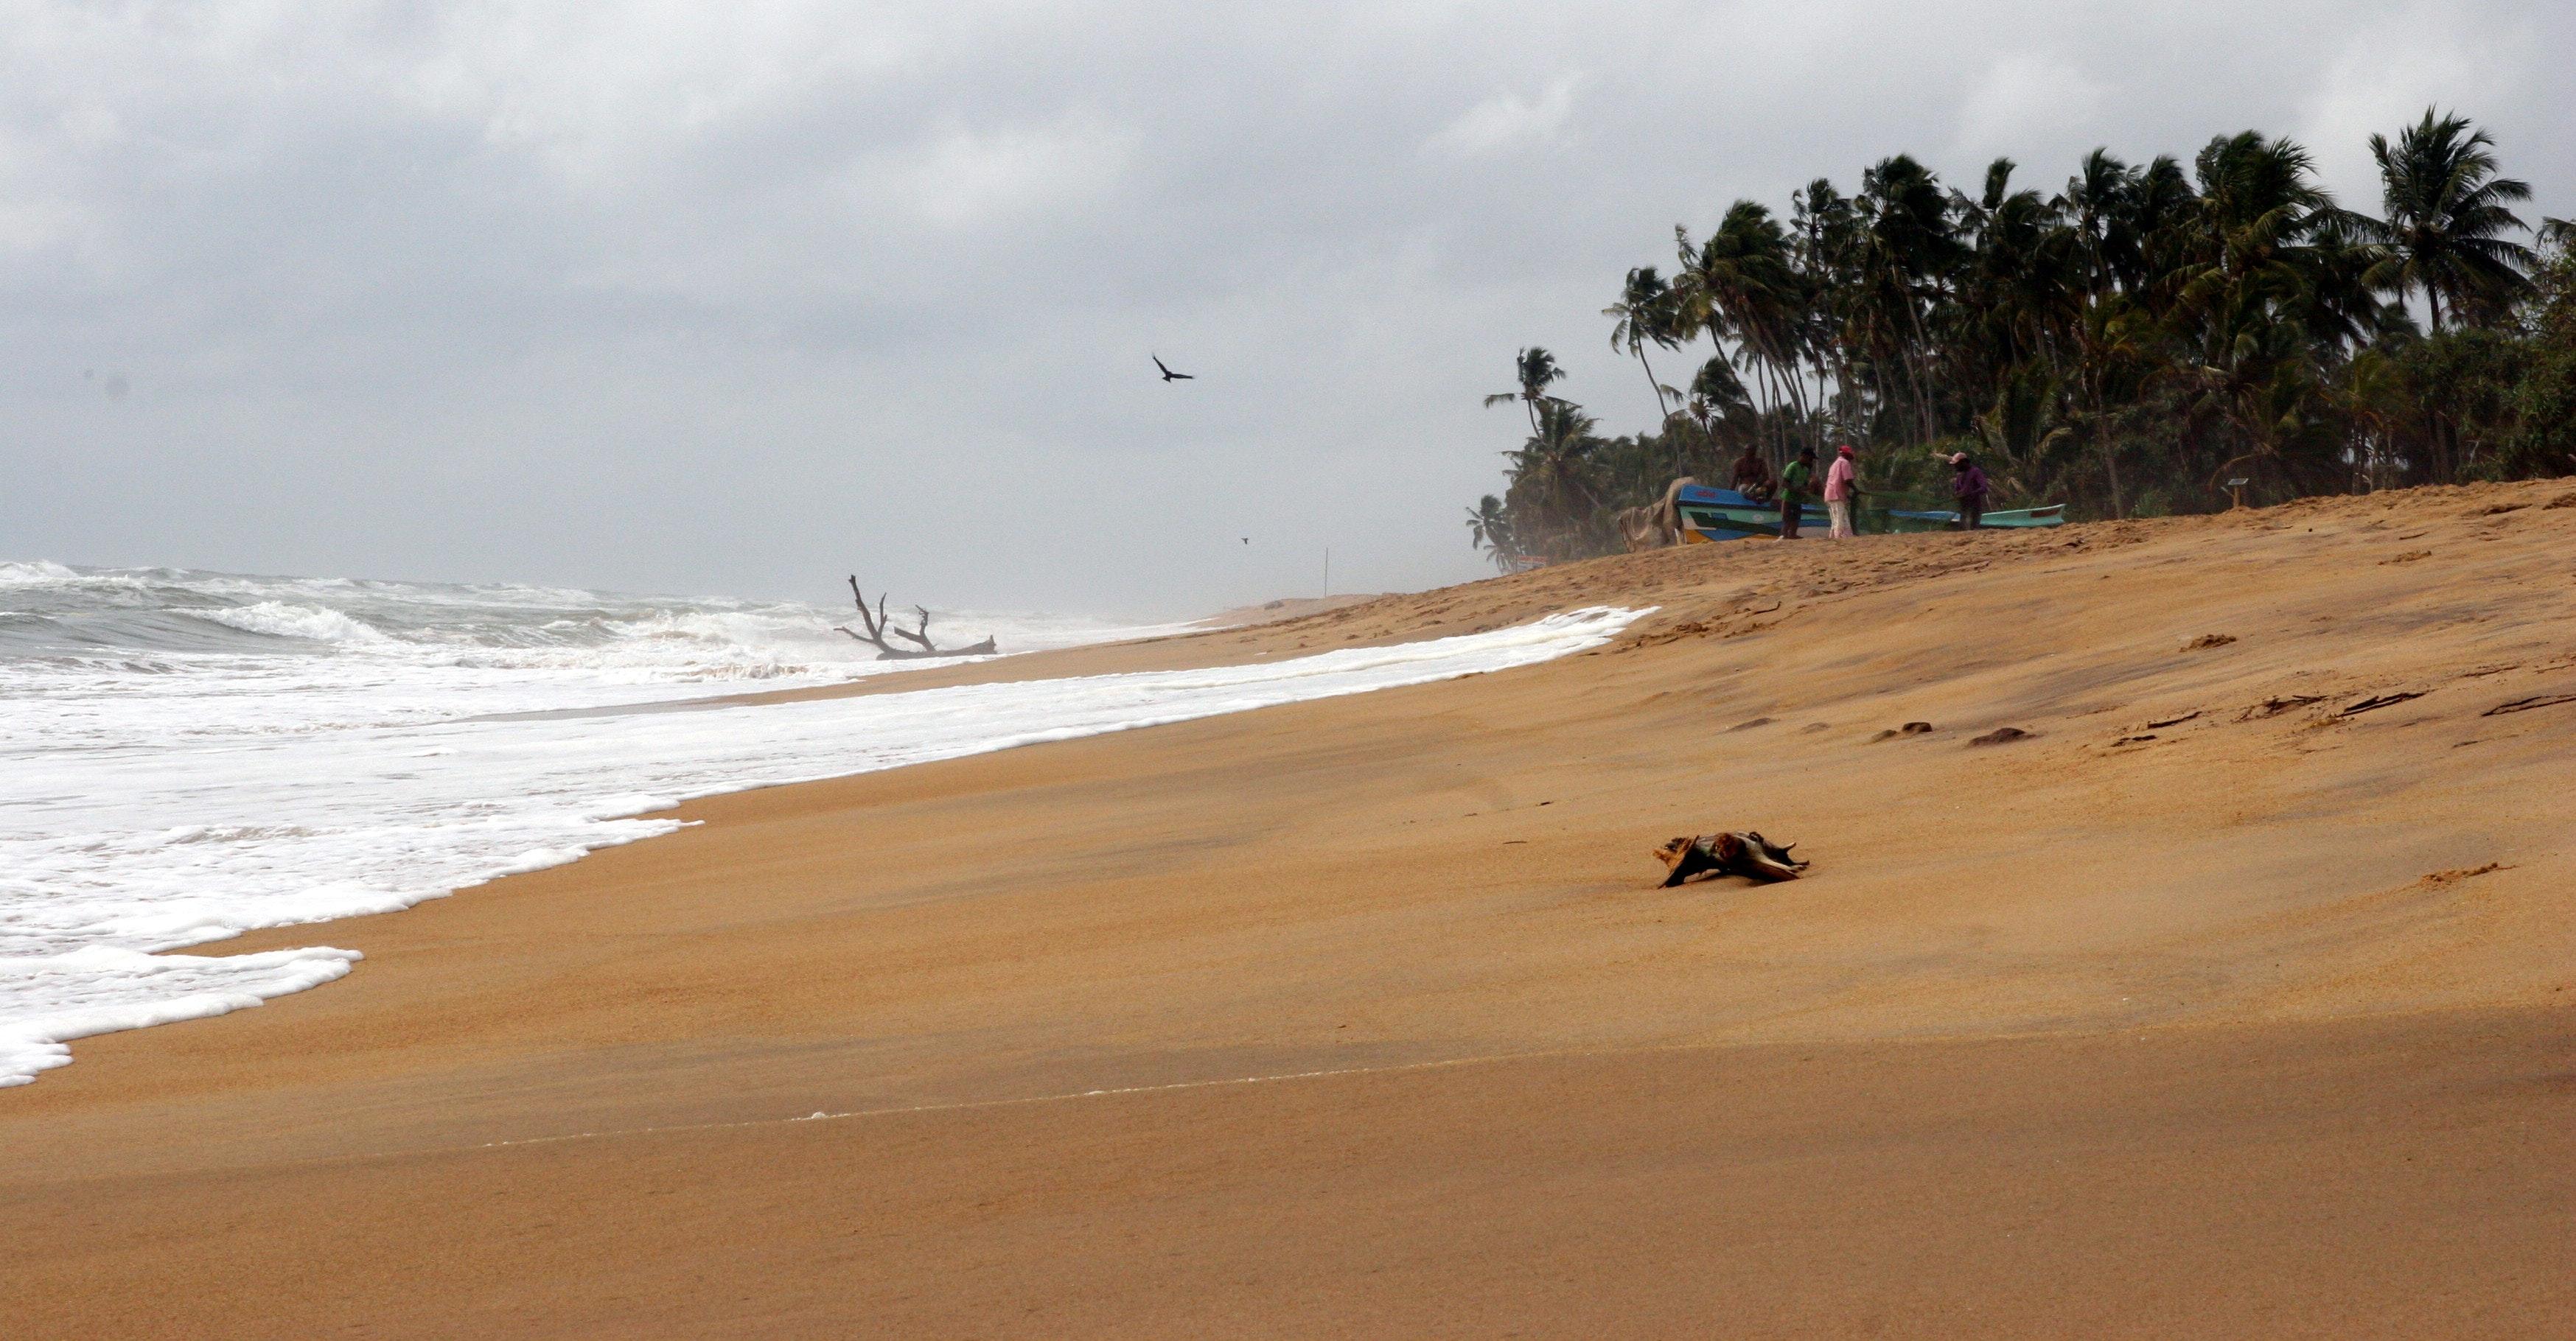 Photo of Seashore, Beach, Seascape, Water, Vacation, HQ Photo